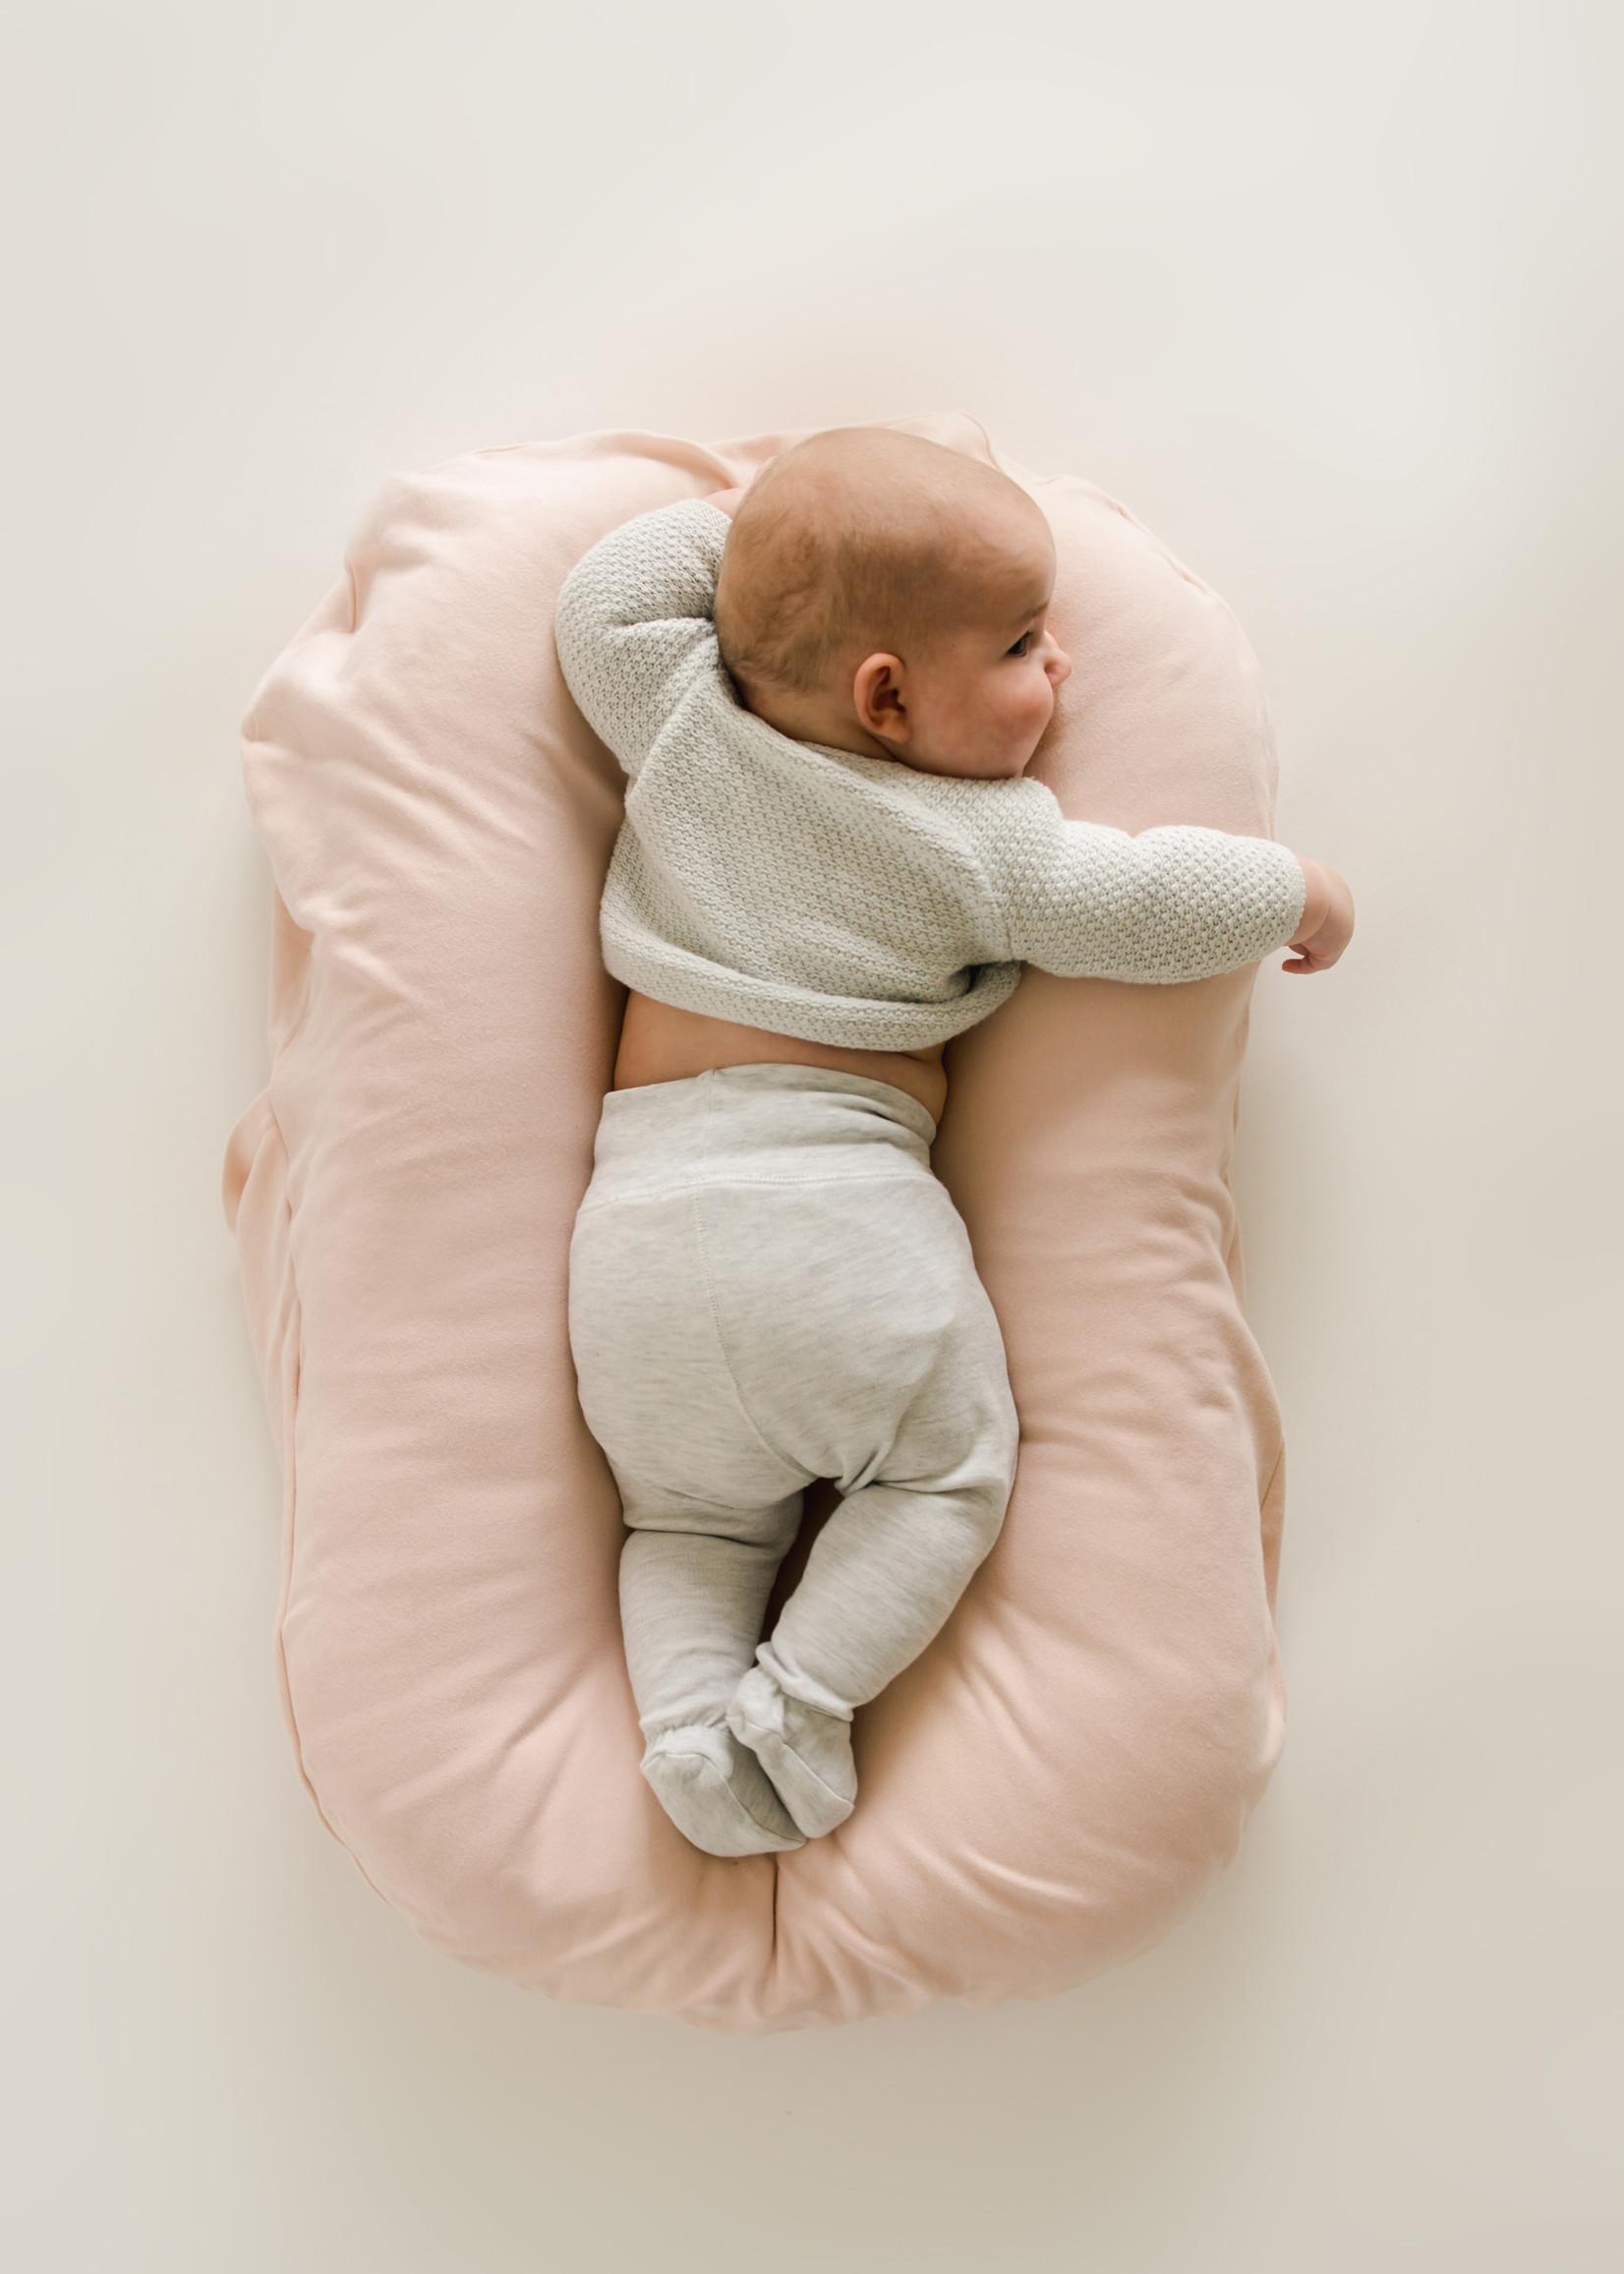 Snuggle Me Infant Lounger Cover - Sugar Plum